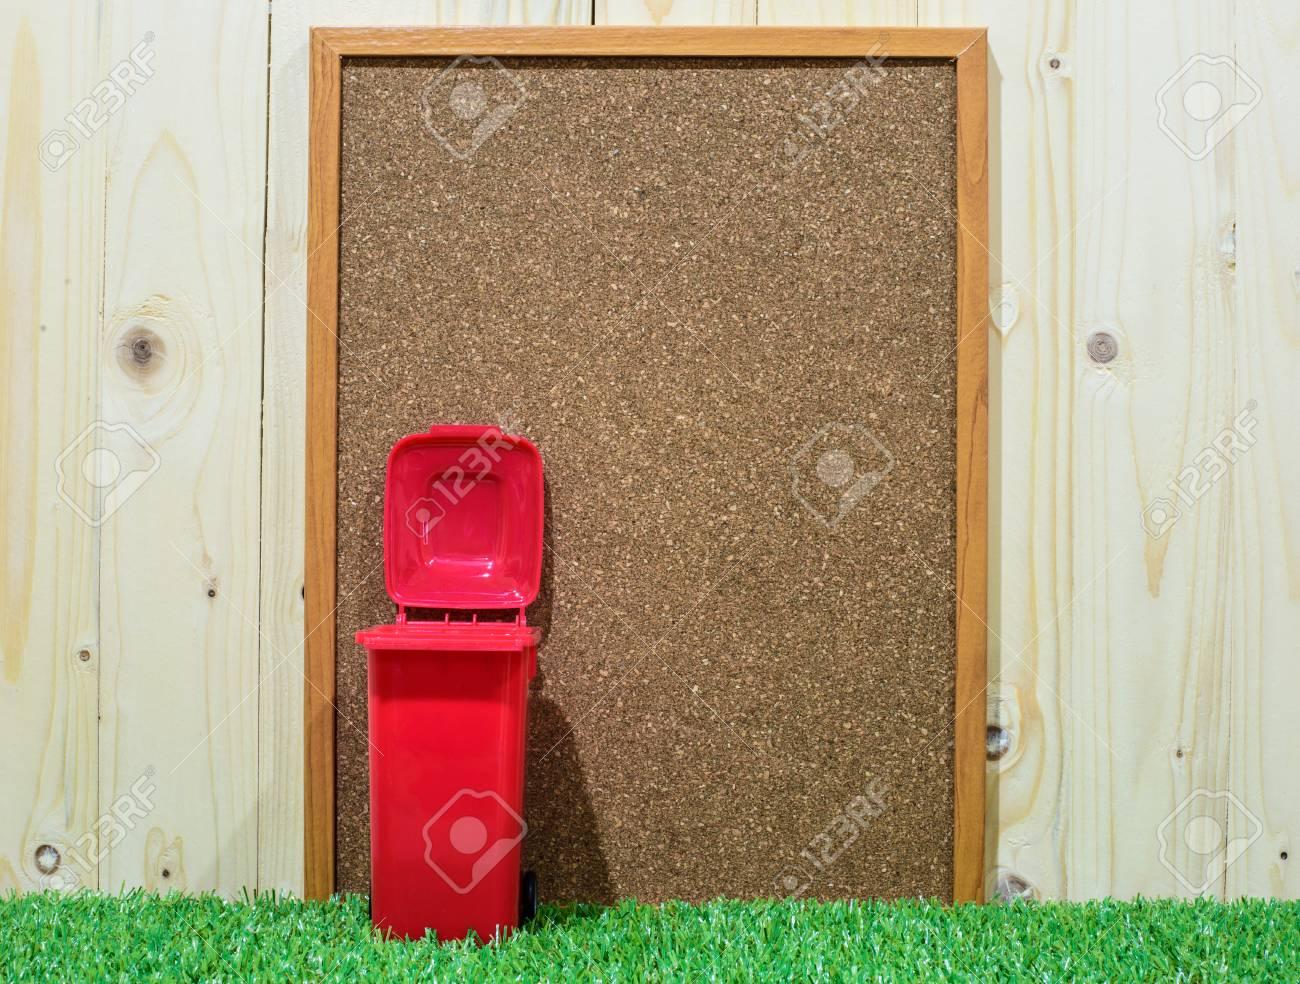 Holz Mulleimer Verkleidung Mulltonne Smartstore